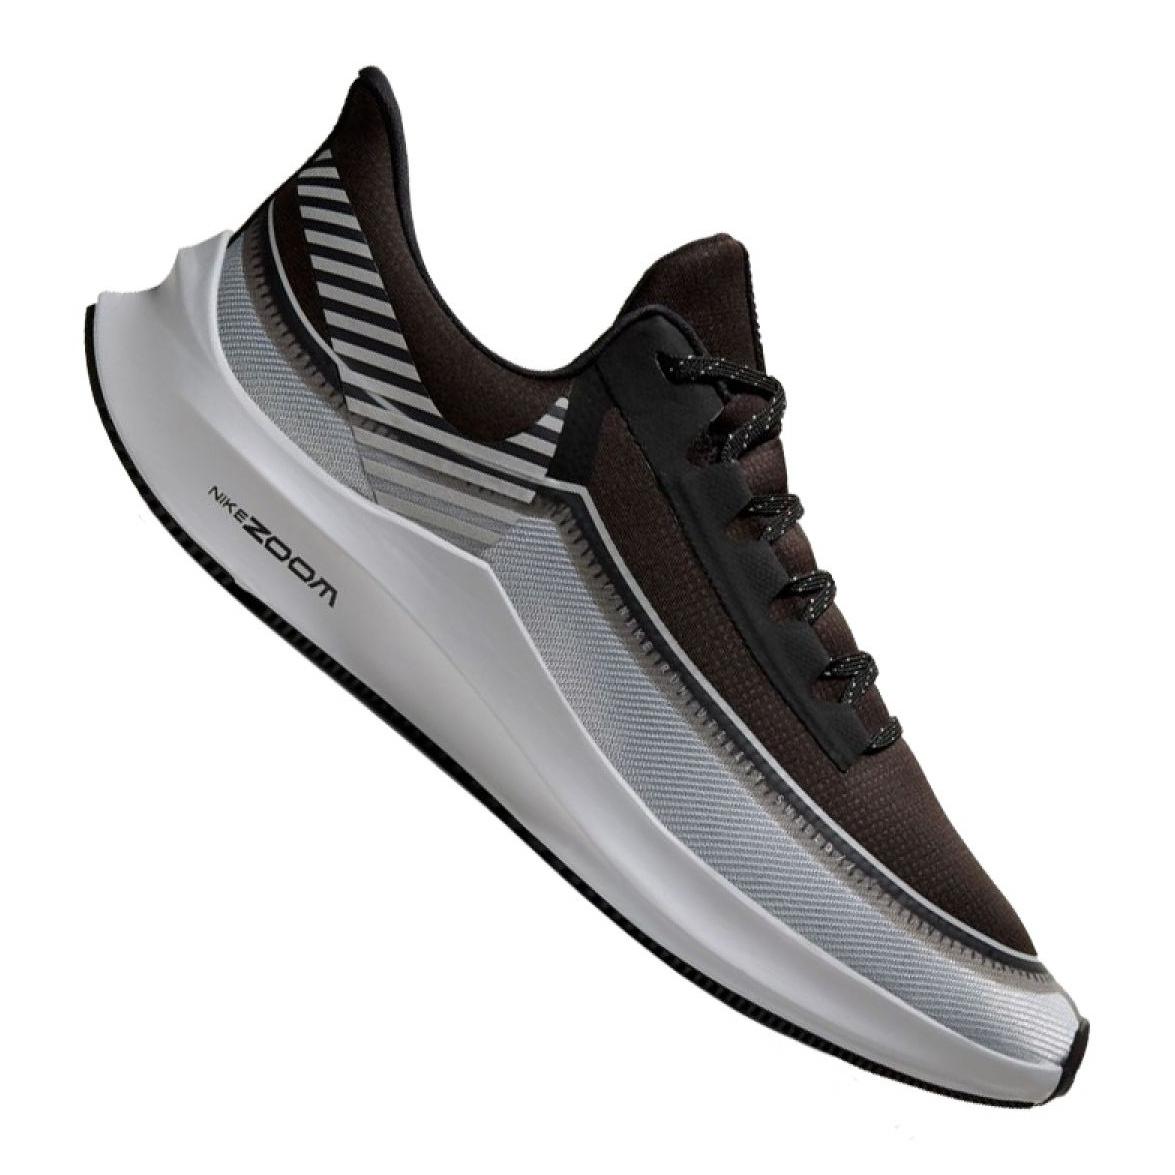 Tênis Nike Zoom Winflo 6 Shield M BQ3190 001 preto